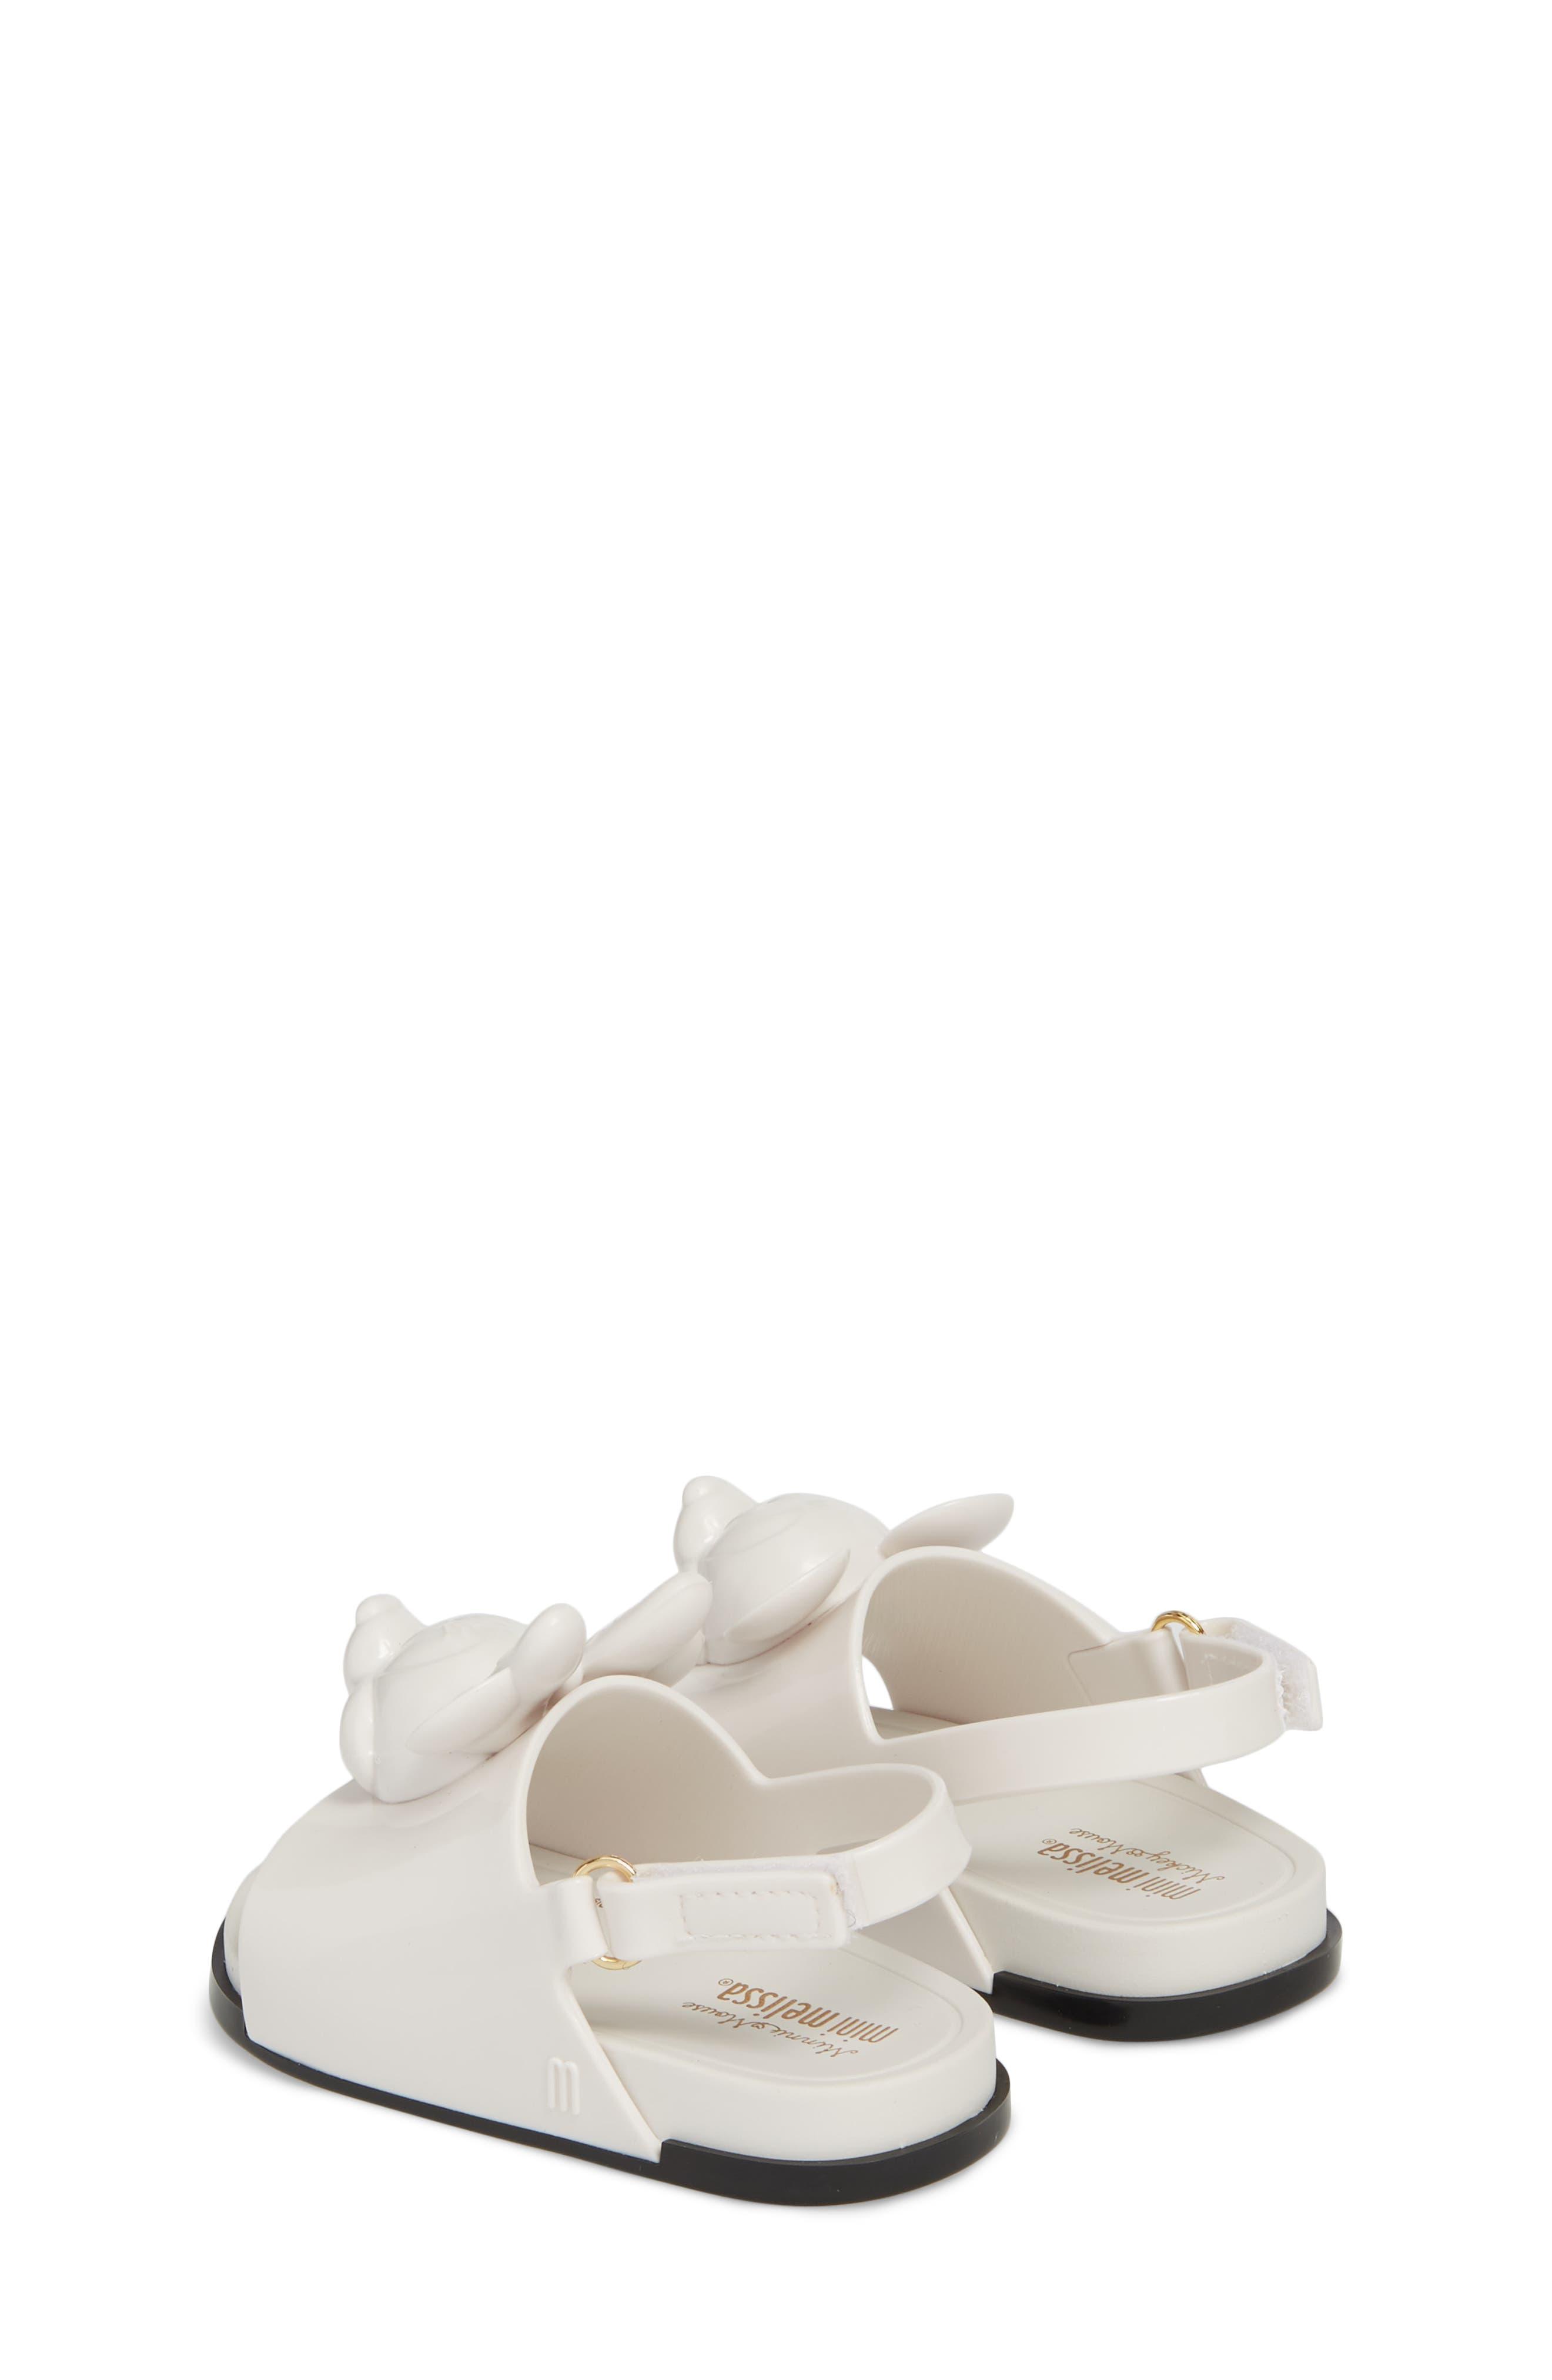 Disney<sup>®</sup> Mini Beach Sandal,                             Alternate thumbnail 10, color,